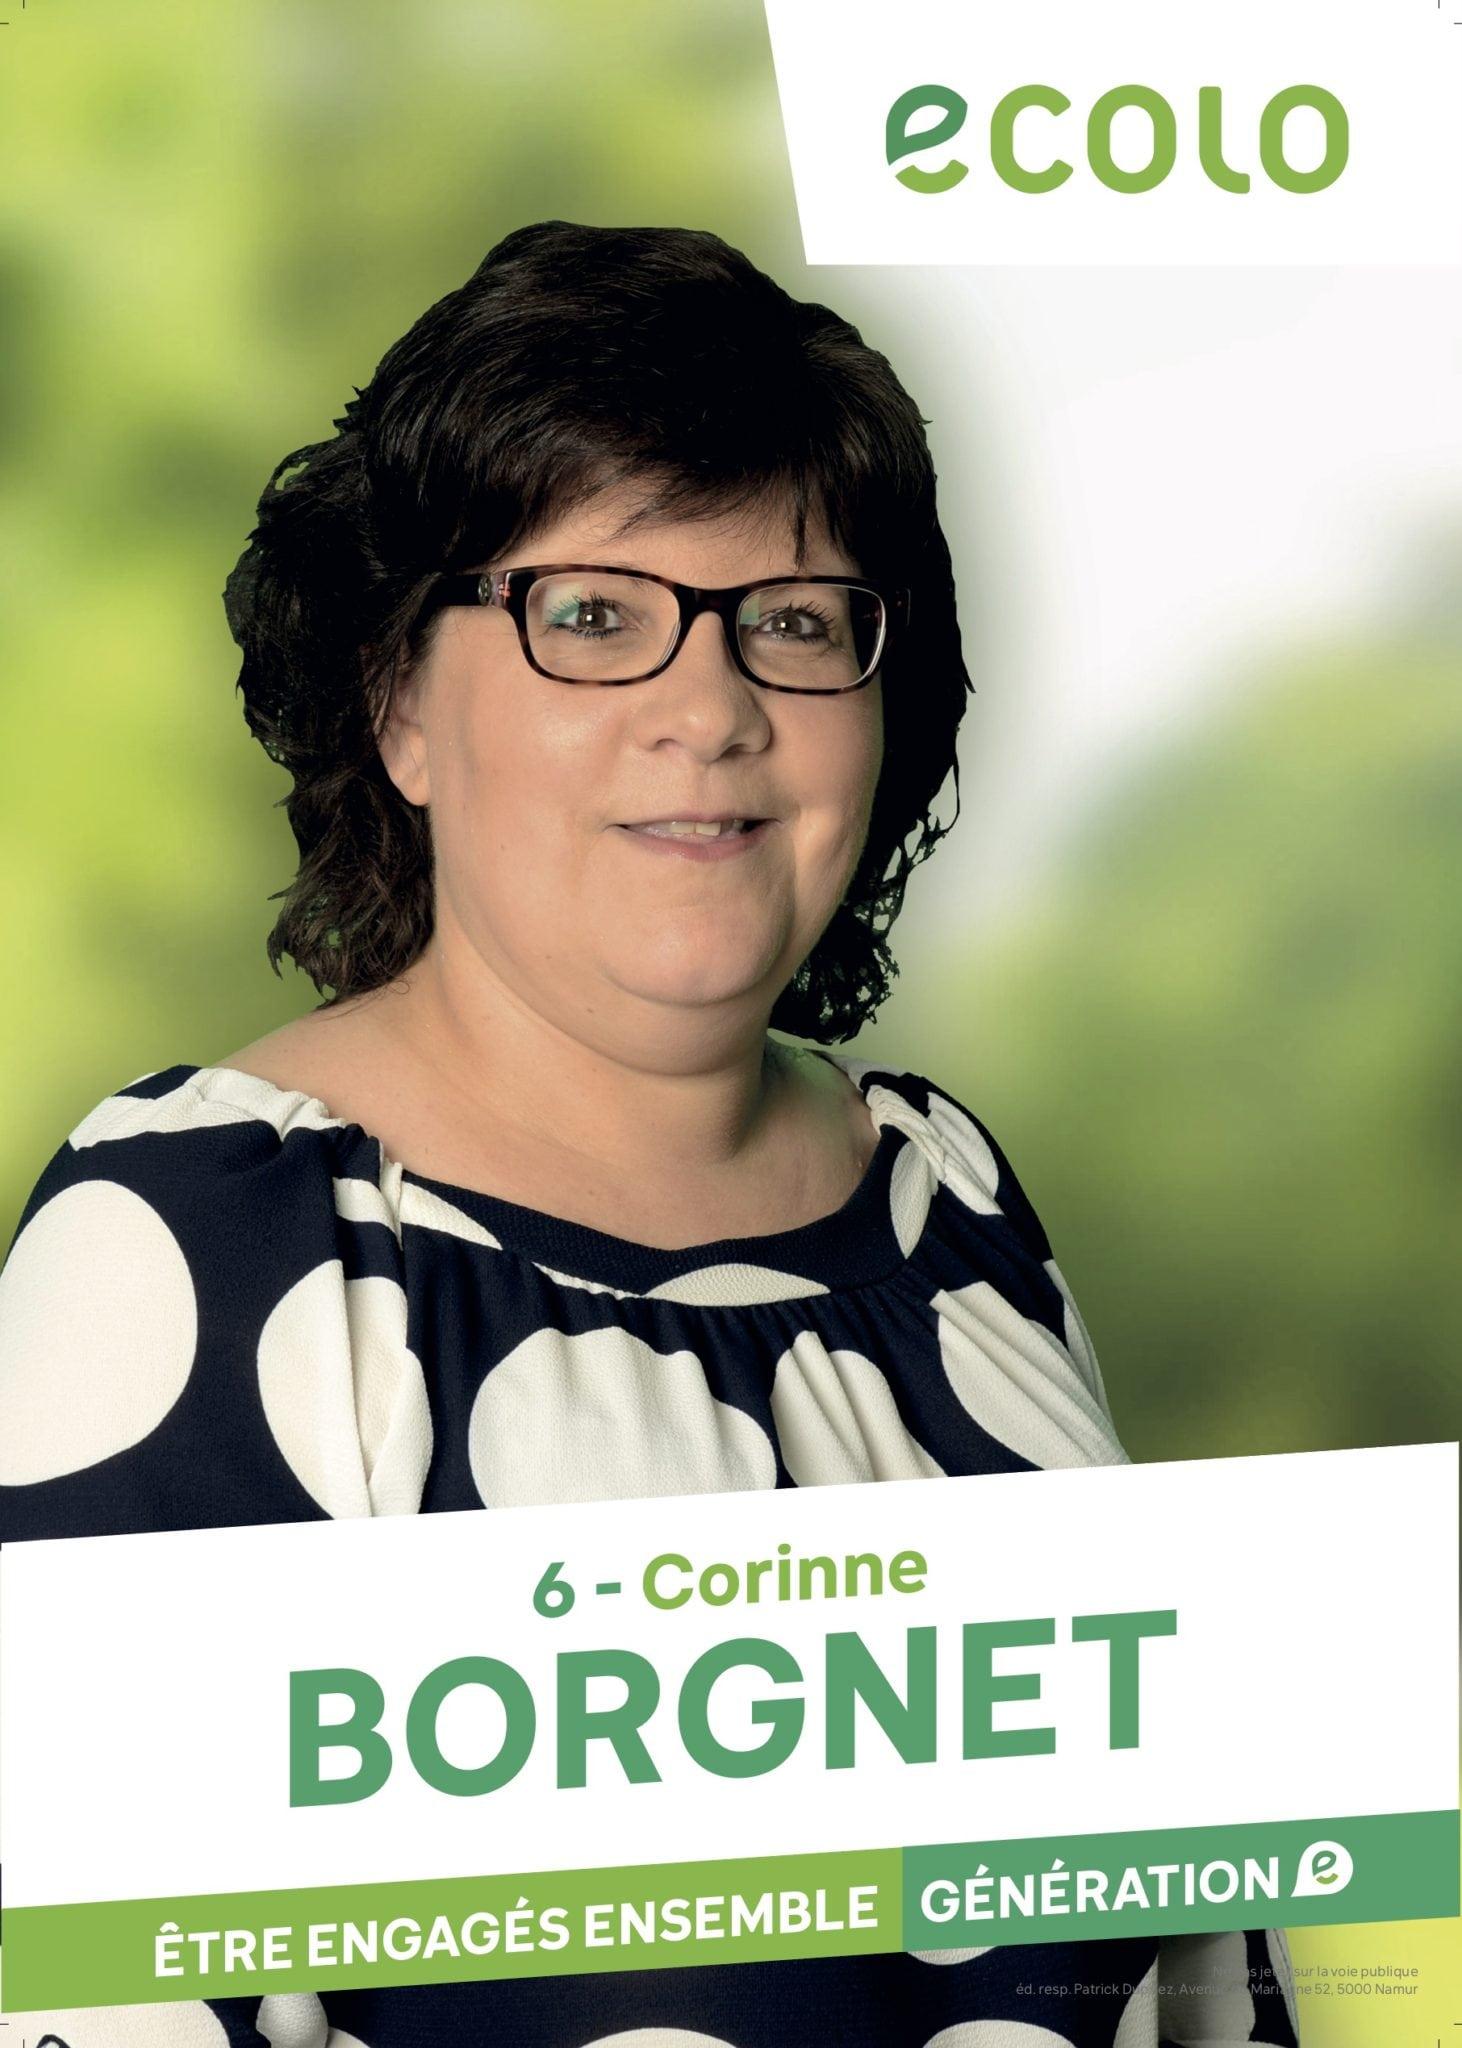 Corinne Borgnet